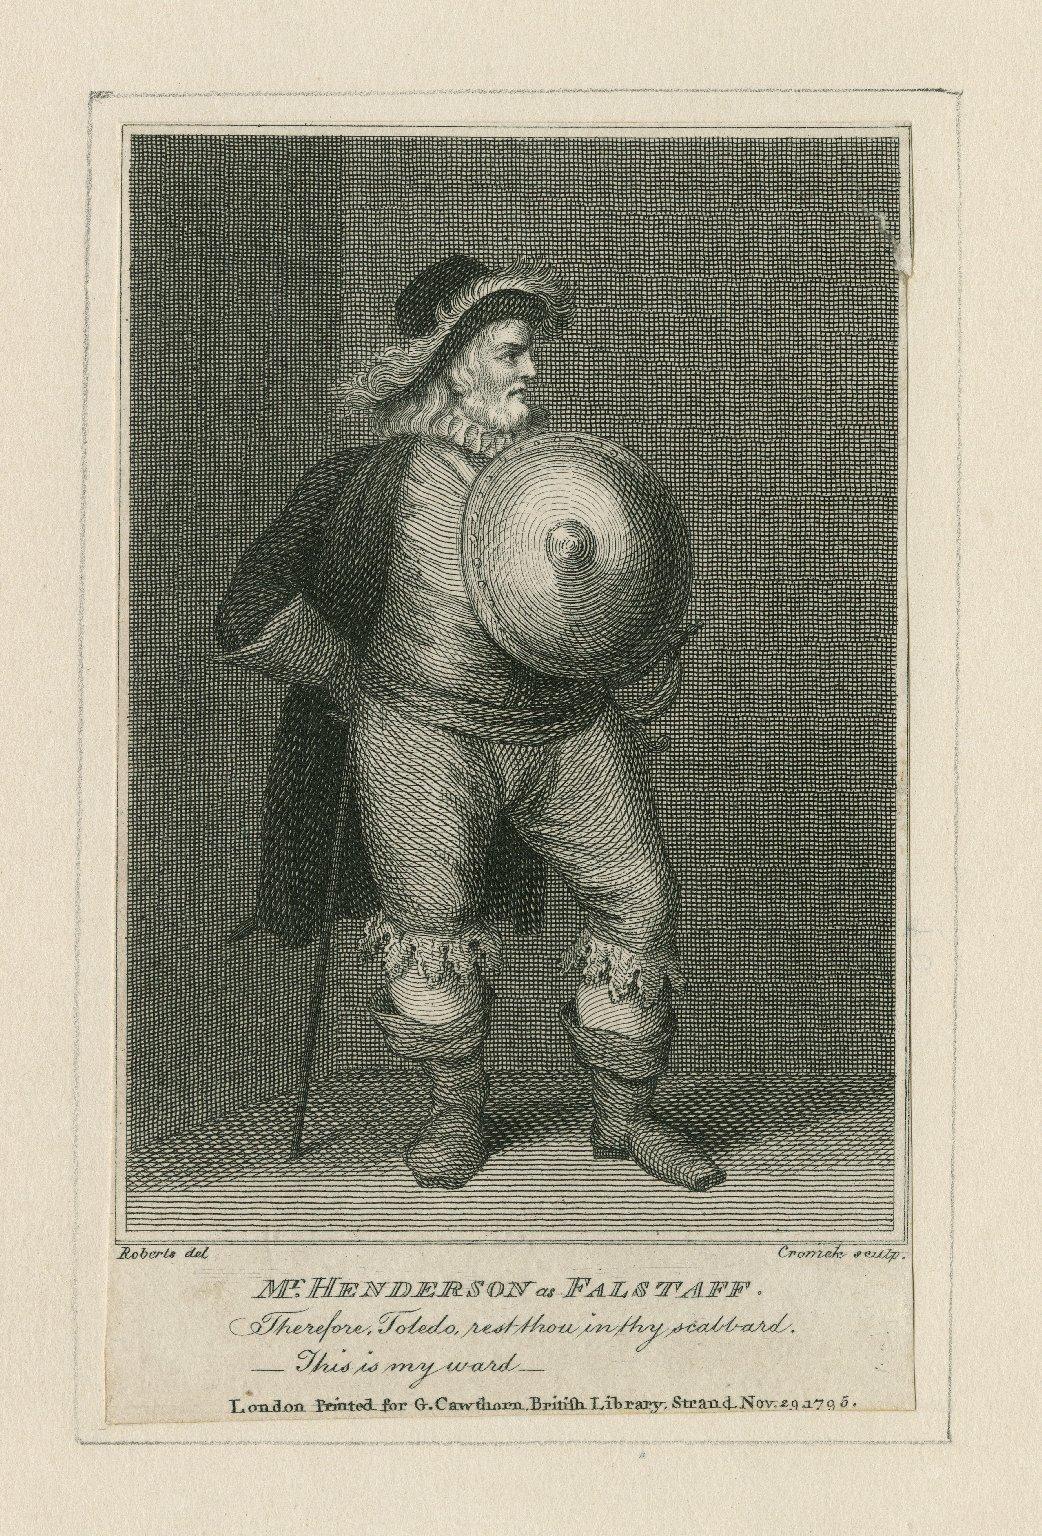 Mr. Henderson as Falstaff [graphic] : [in Kenrick's Falstaff's wedding] : Therefore, Toledo, rest thou ... / Roberts, del. ; Cromek, sculp.